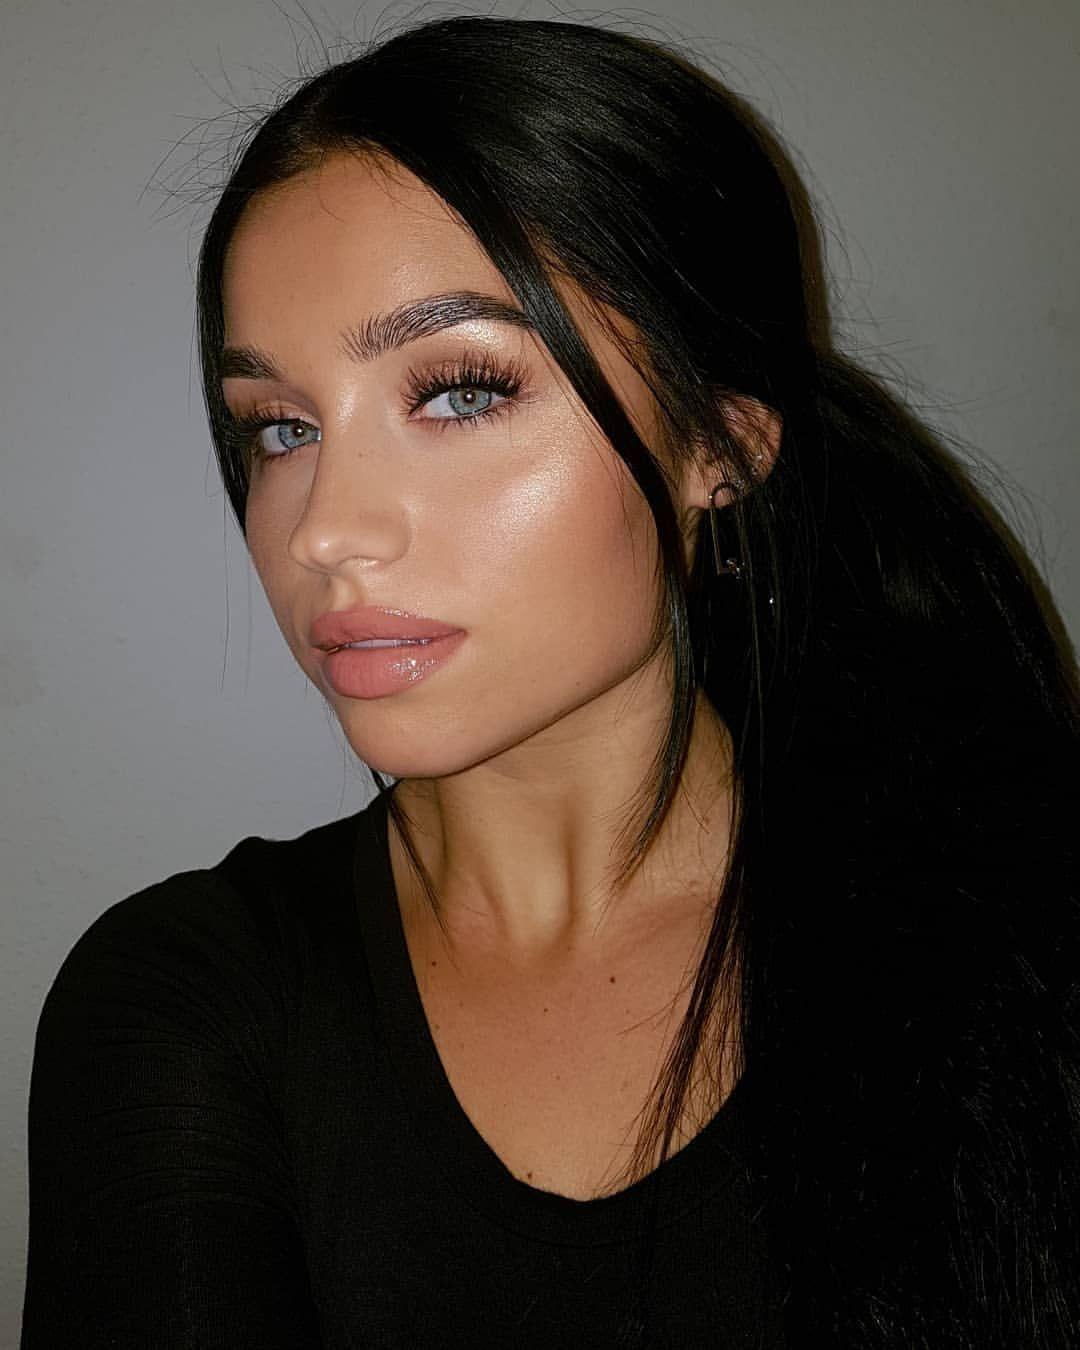 Yuliamiia On Instagram I Tried To Smile But No Advertisement Wearing Cleoncosmetics In B In 2020 Brown Eyes Black Hair Black Hair Green Eyes Dark Hair Blue Eyes